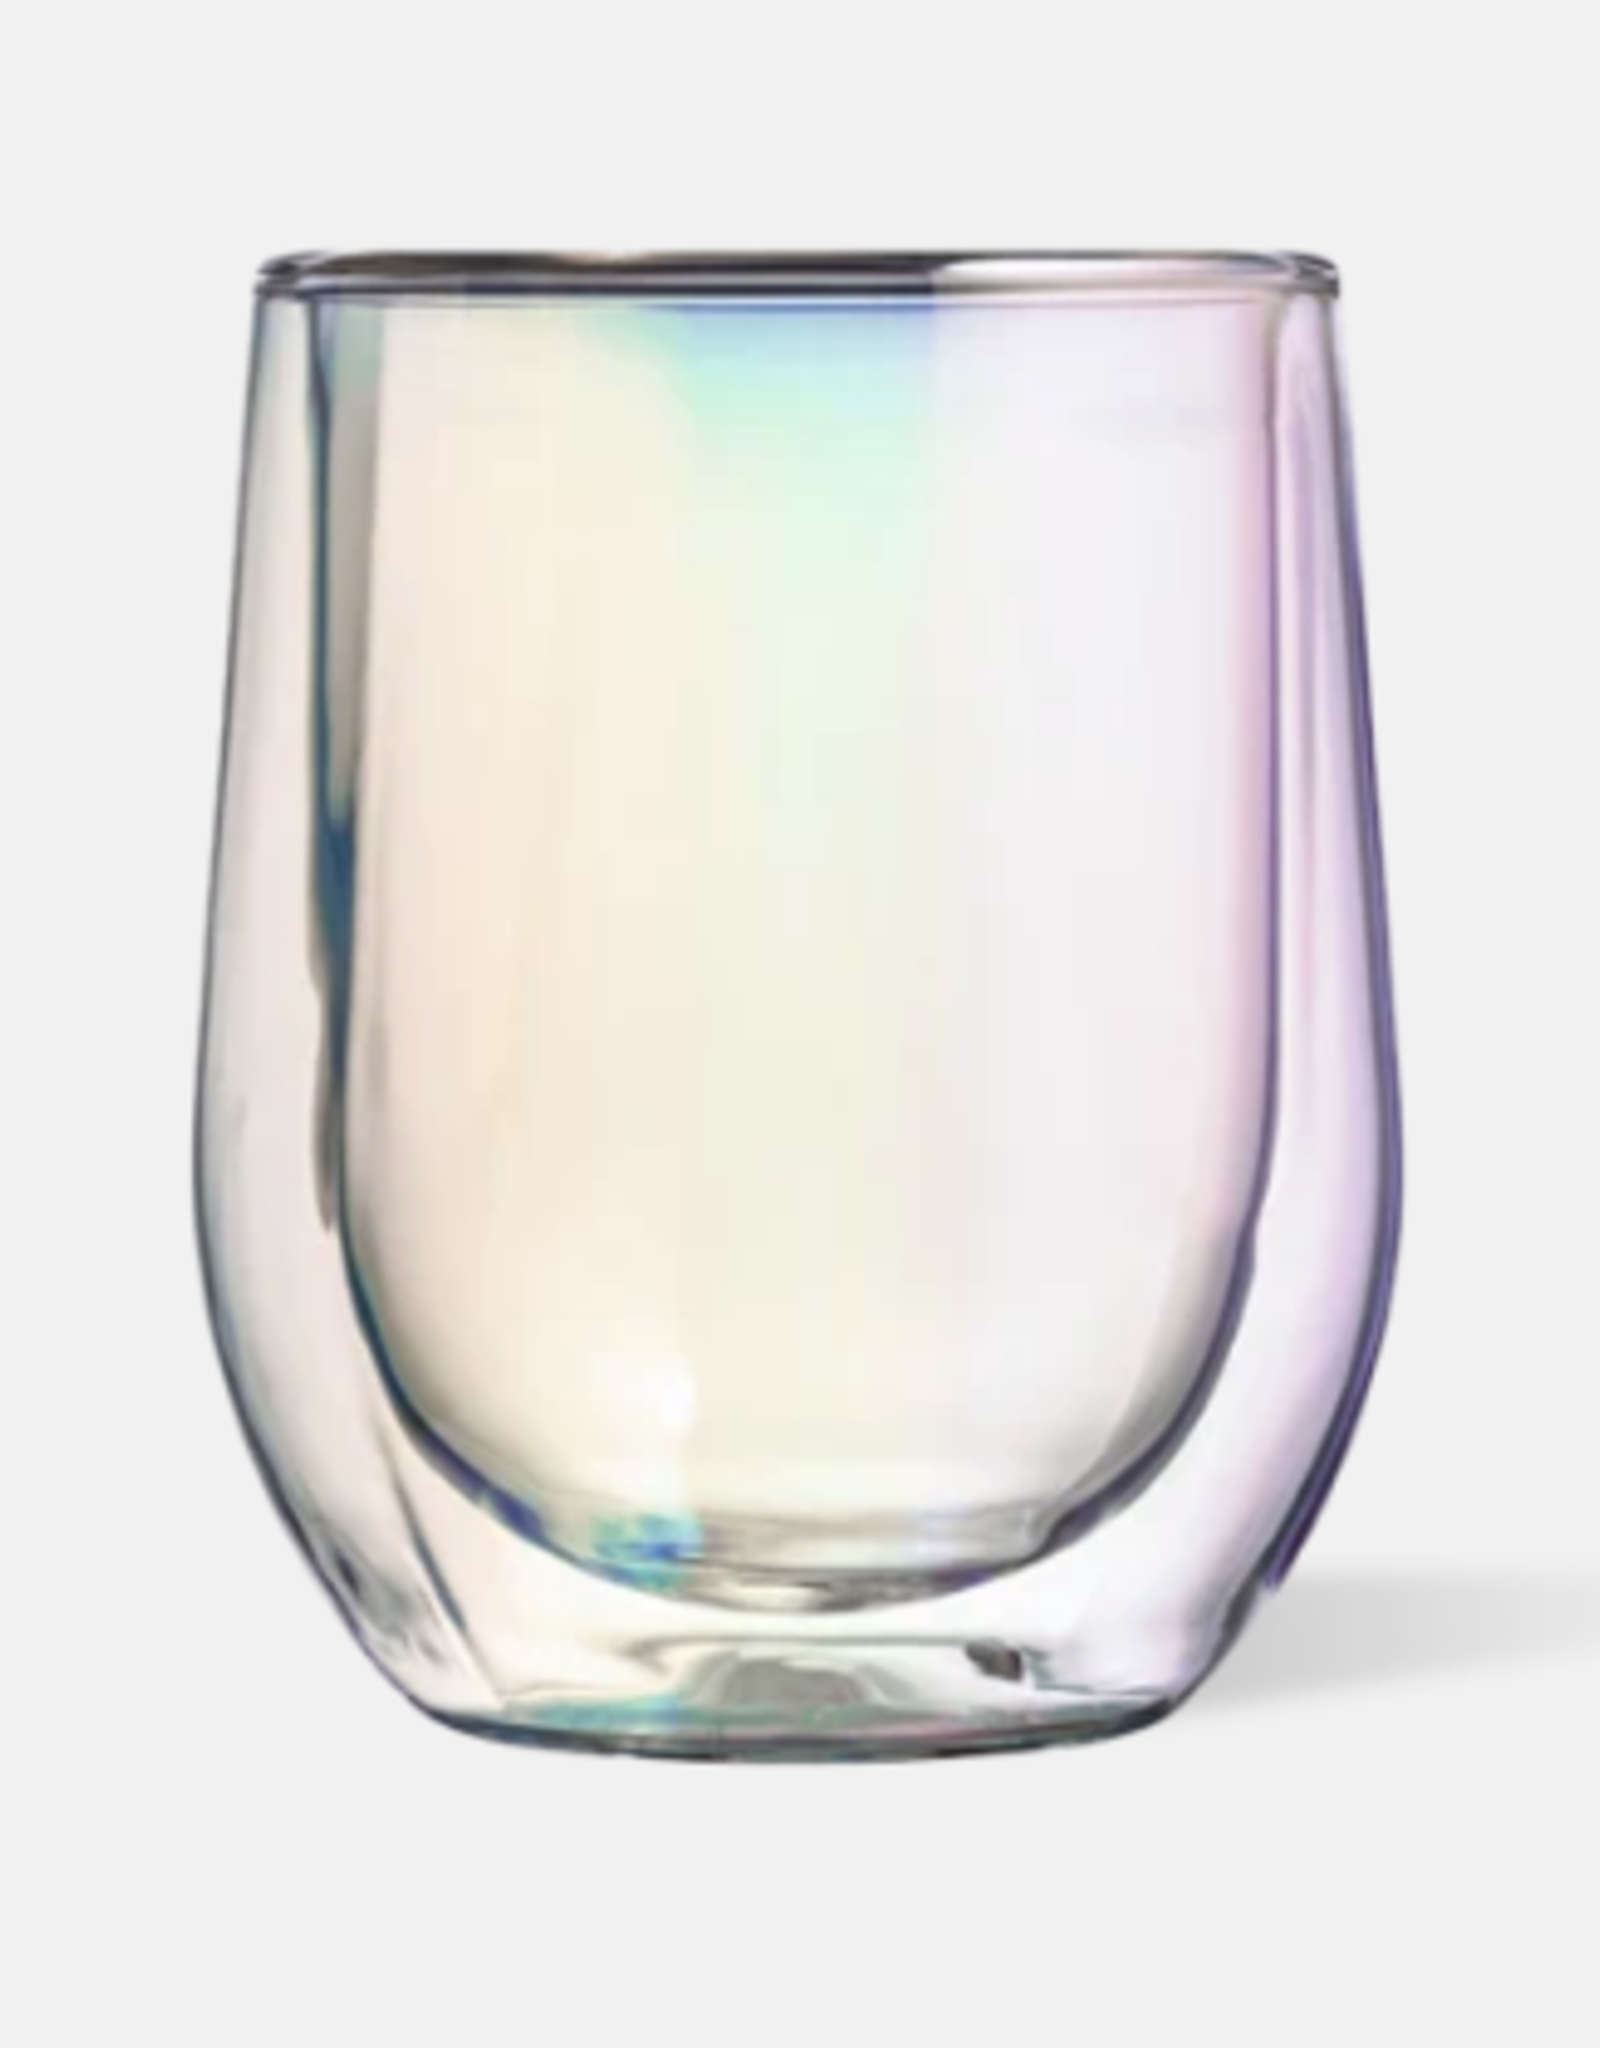 Corkcicle Corkcicle - Prism Stemless Glass Set of 2